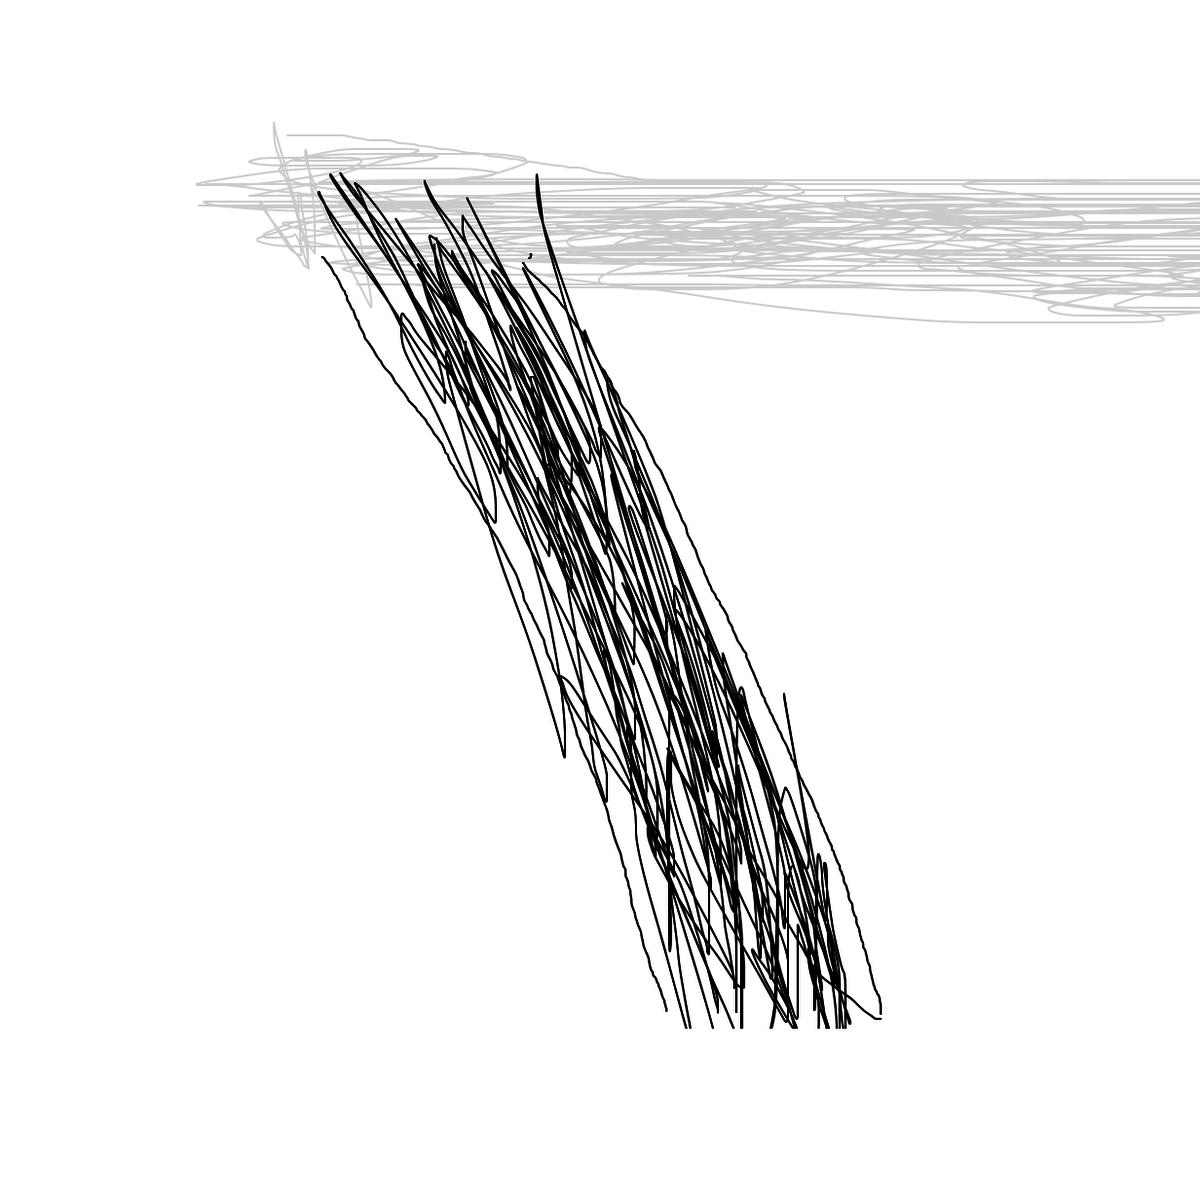 BAAAM drawing#11401 lat:52.4759597778320300lng: 13.4057912826538090